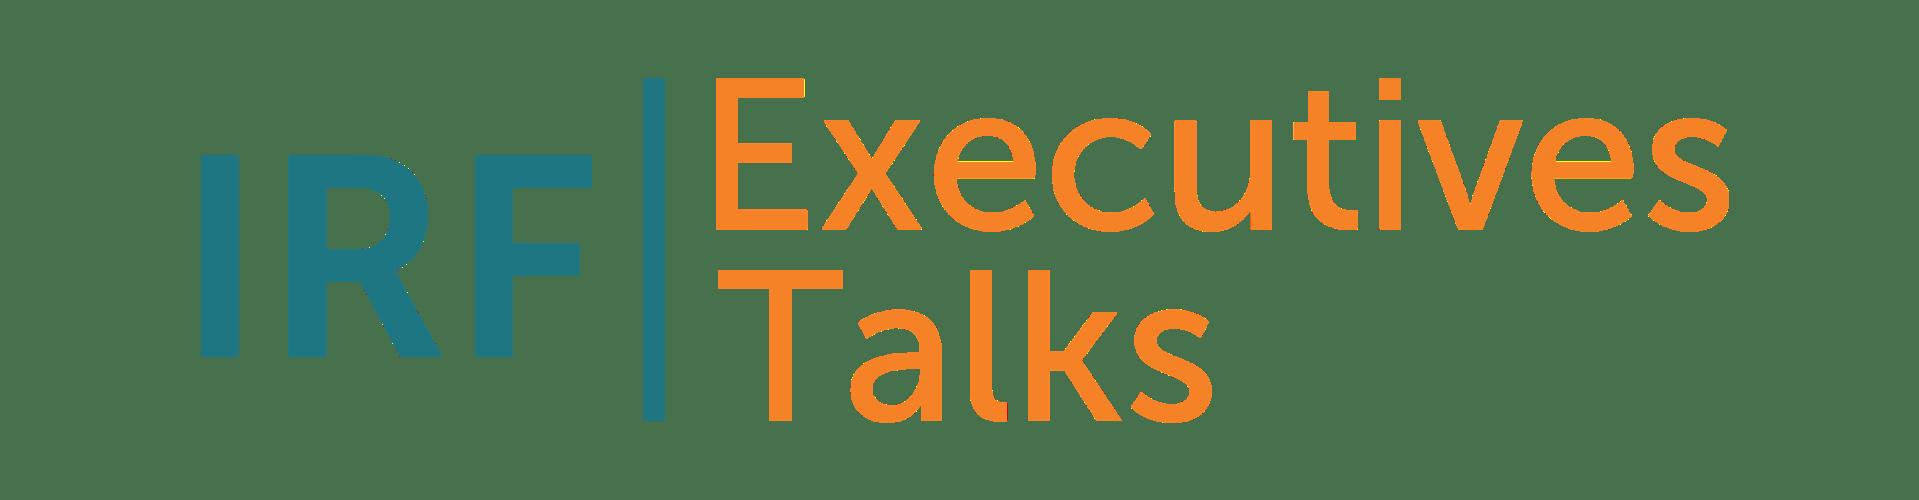 IRF Executives Talks